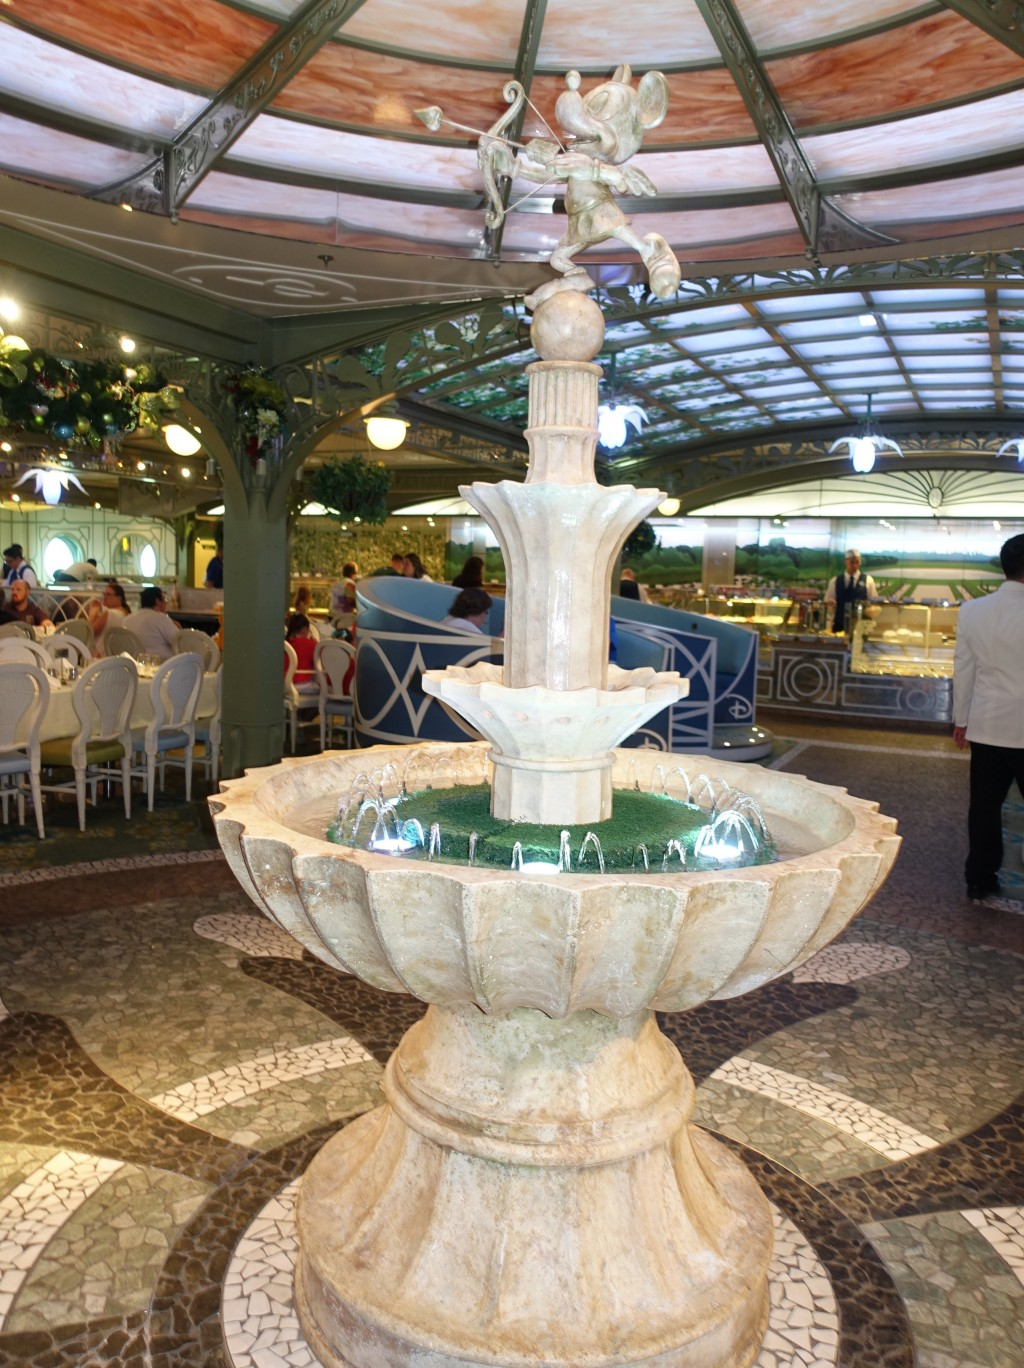 WDW旅行記ブログ/DCL旅行記ブログ ディズニークルーズライン4泊バハマ航路 エンチャンテッドガーデンで朝食